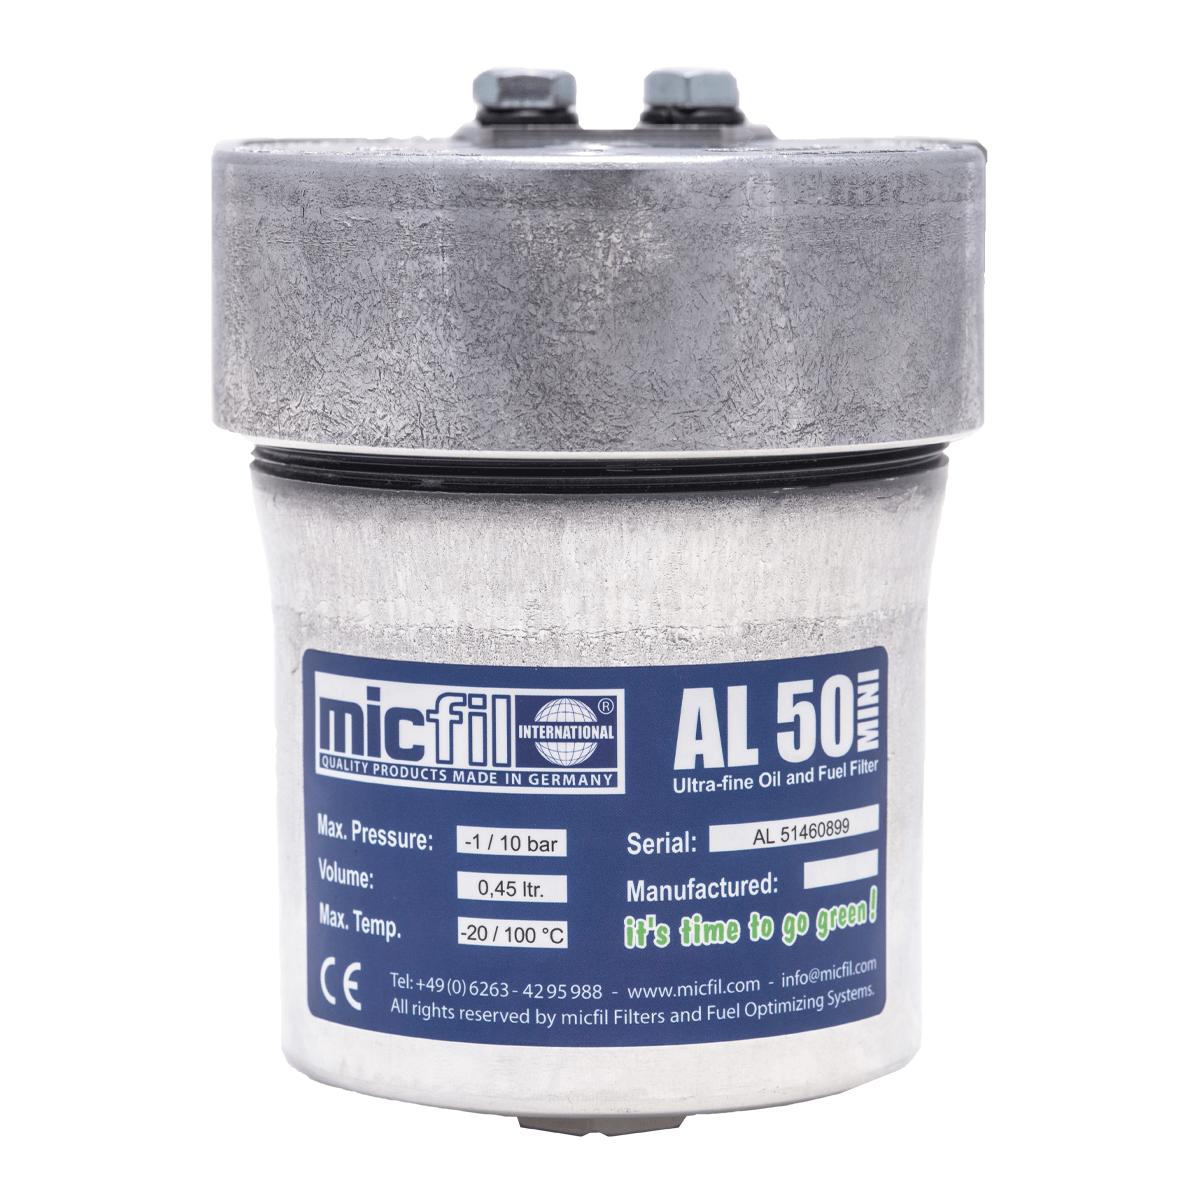 Micfil AL50MINI brandstoffilter - oliefilter systeem